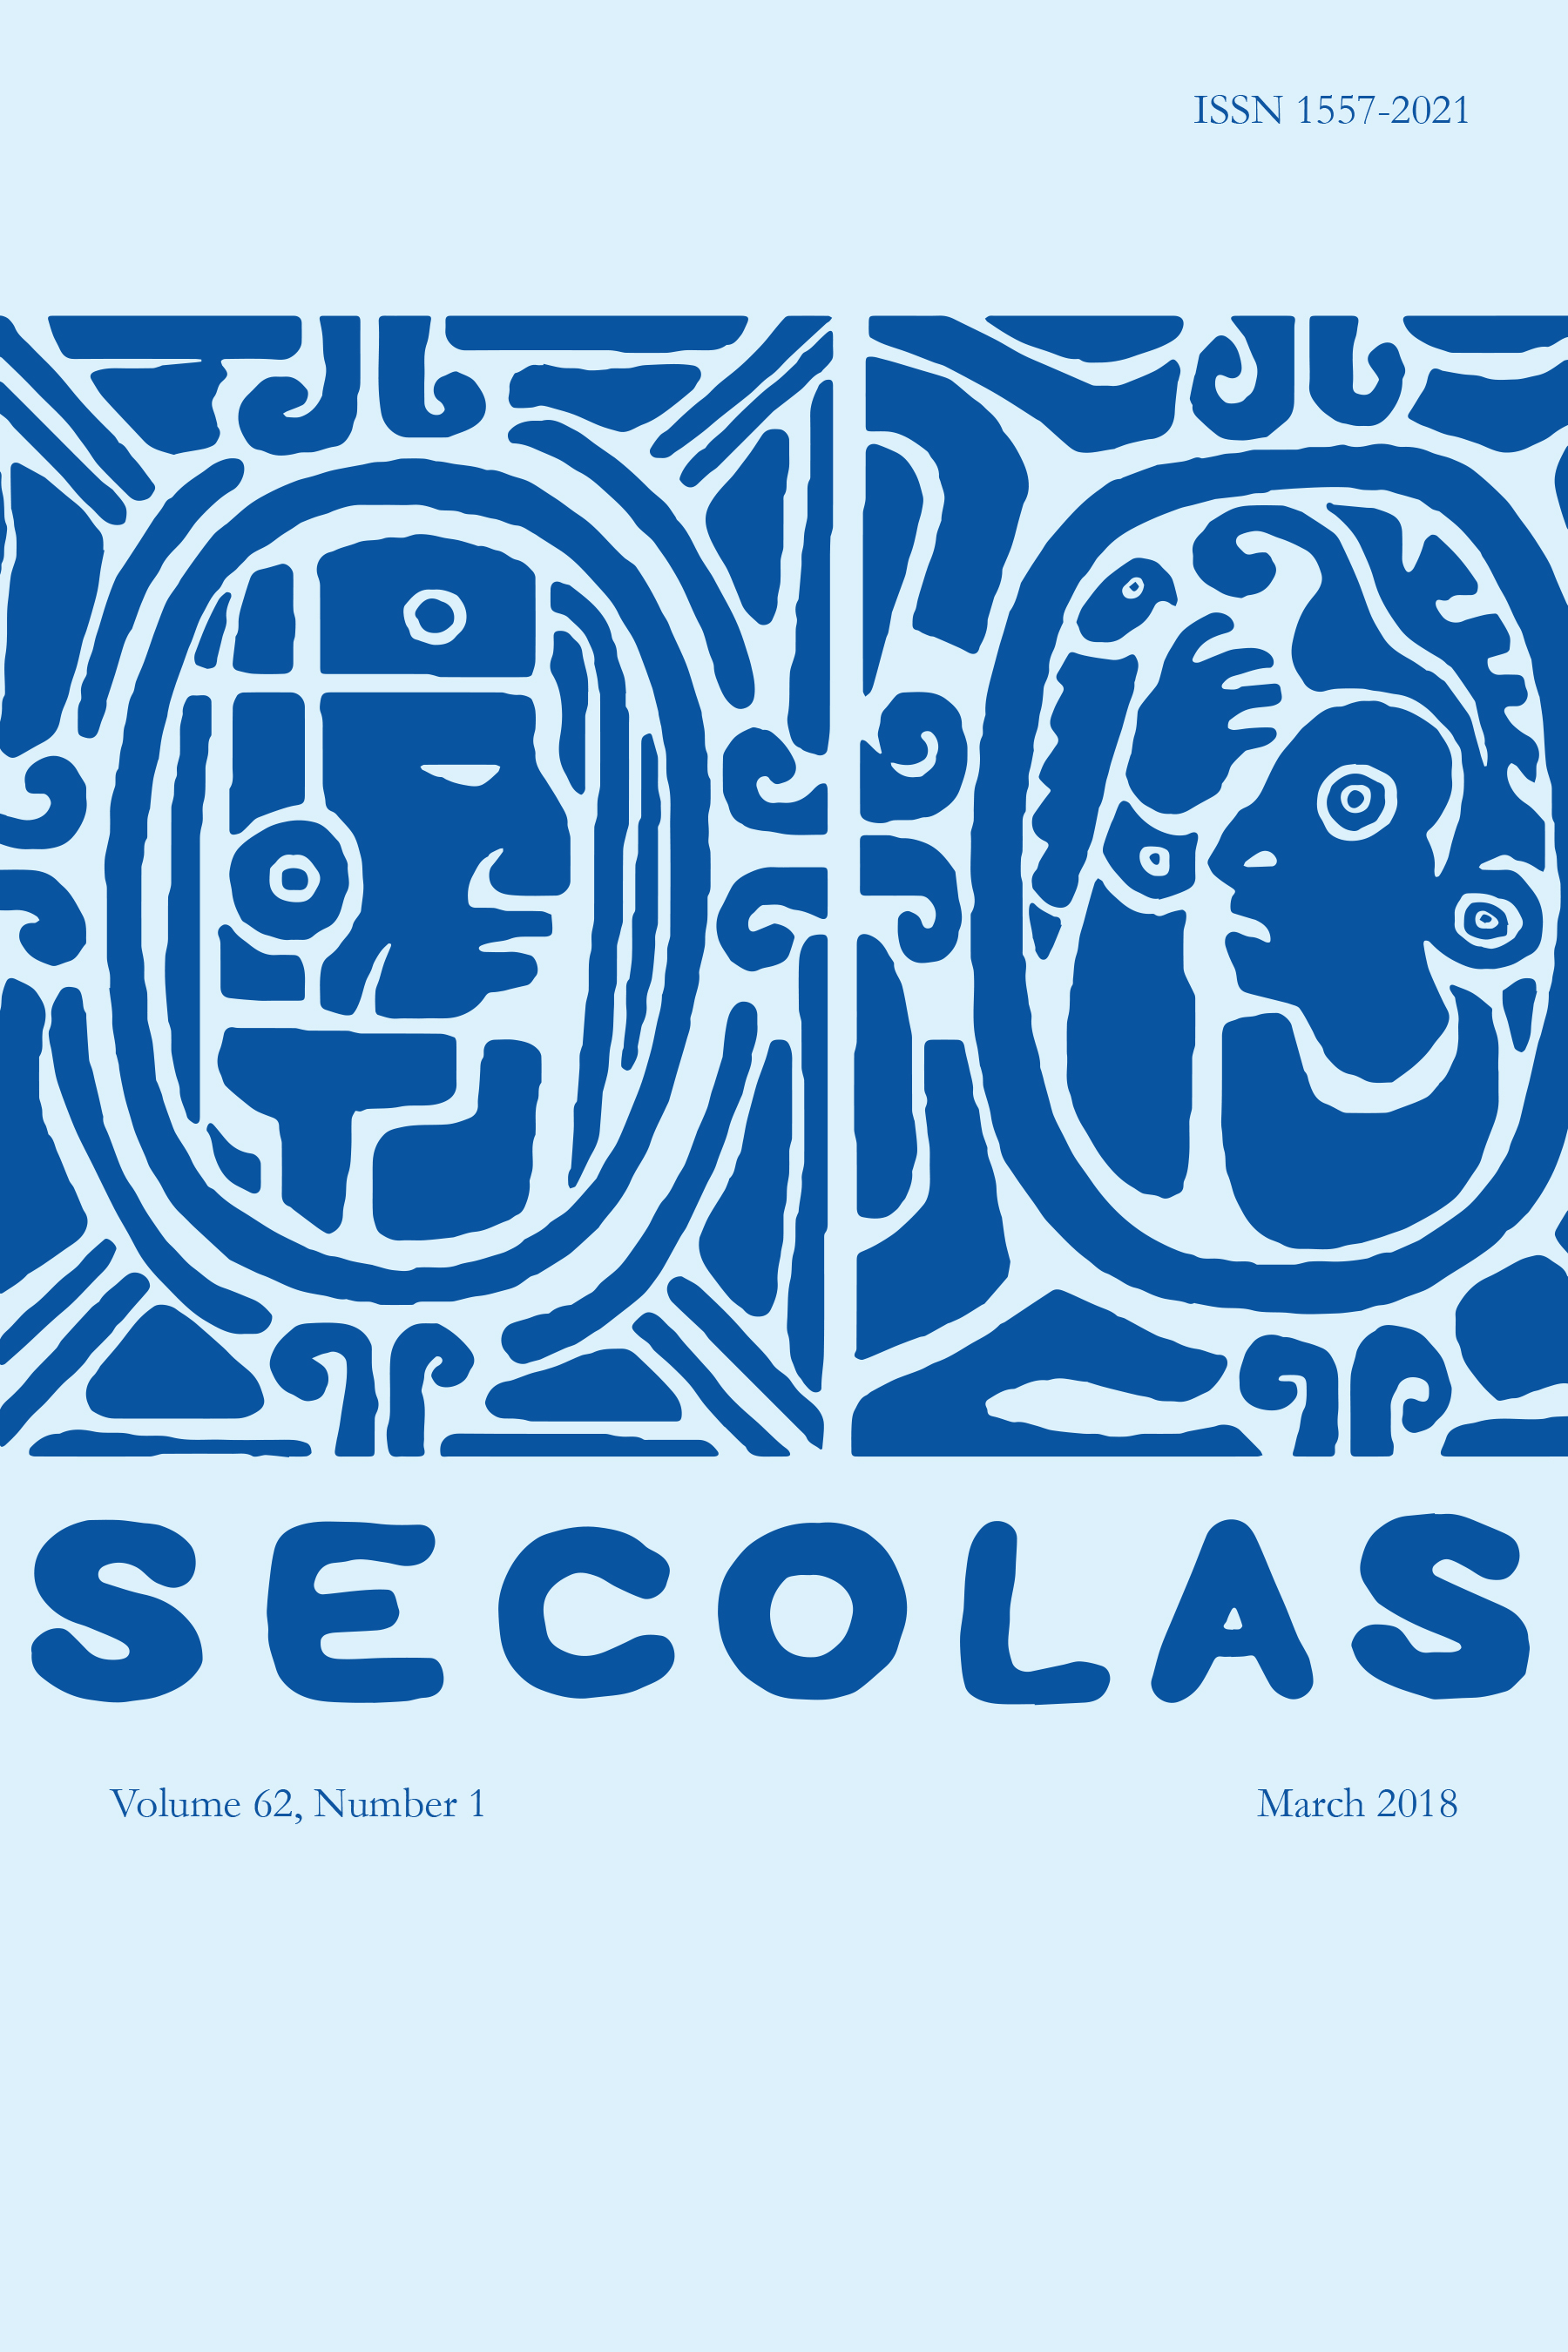 The Latin Americanist, Vol. 62, No. 1, March 2018